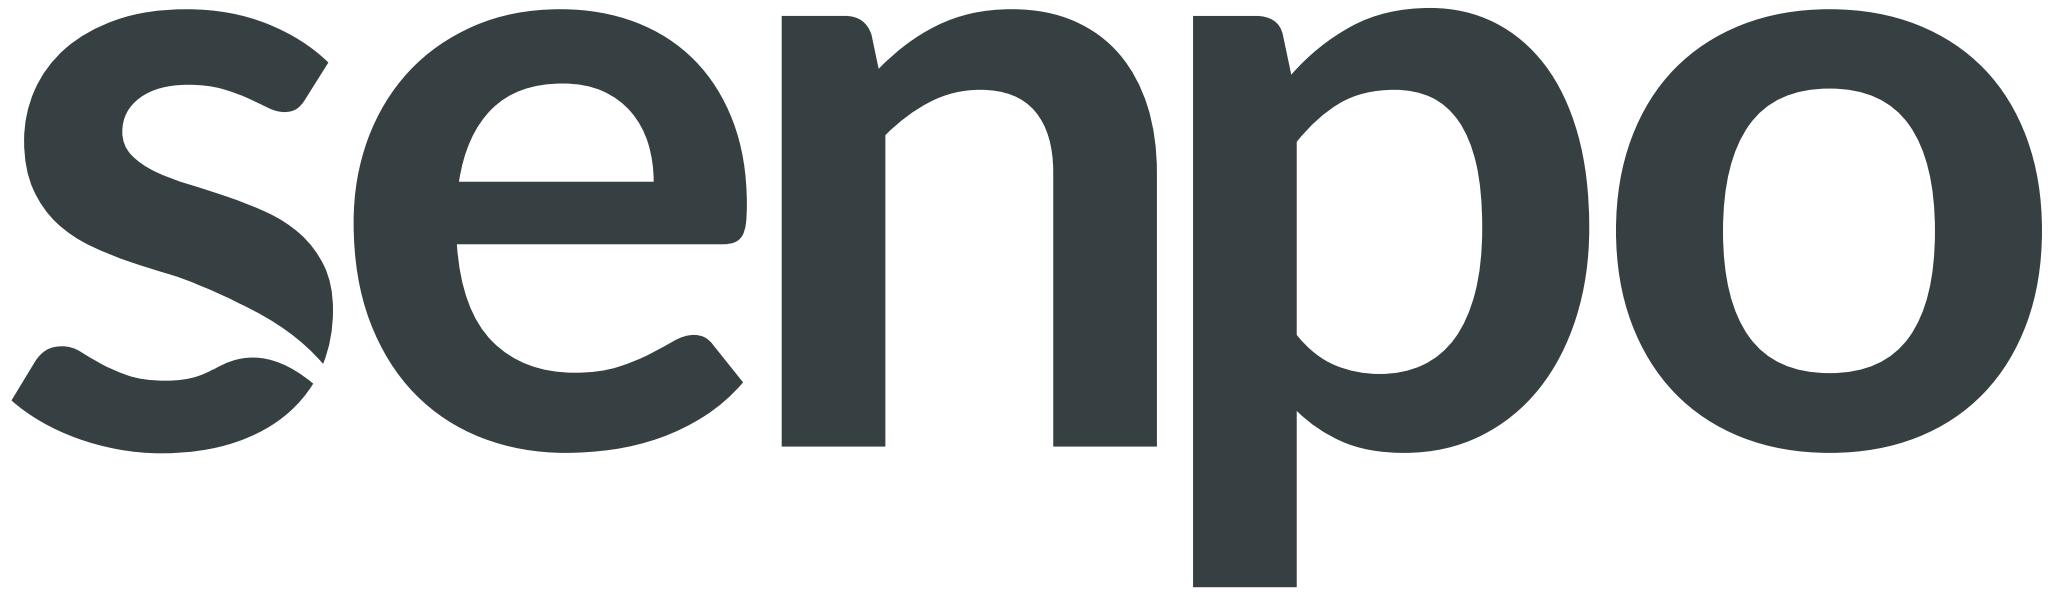 SENPO 30